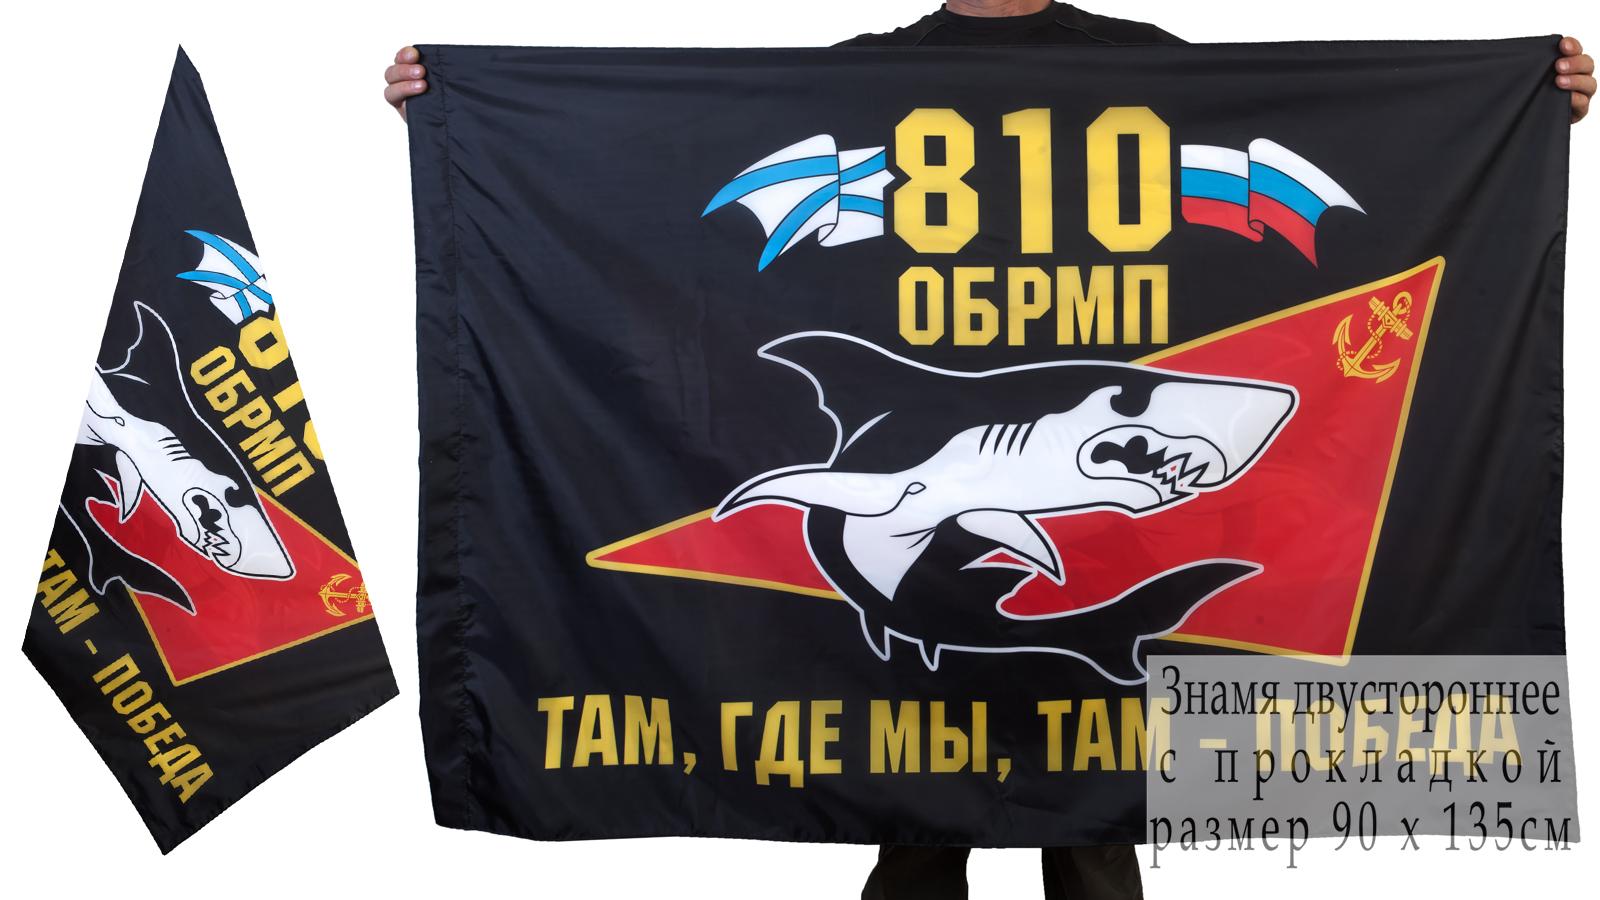 Флаг морпехов 810-ой ОБрМП с девизом